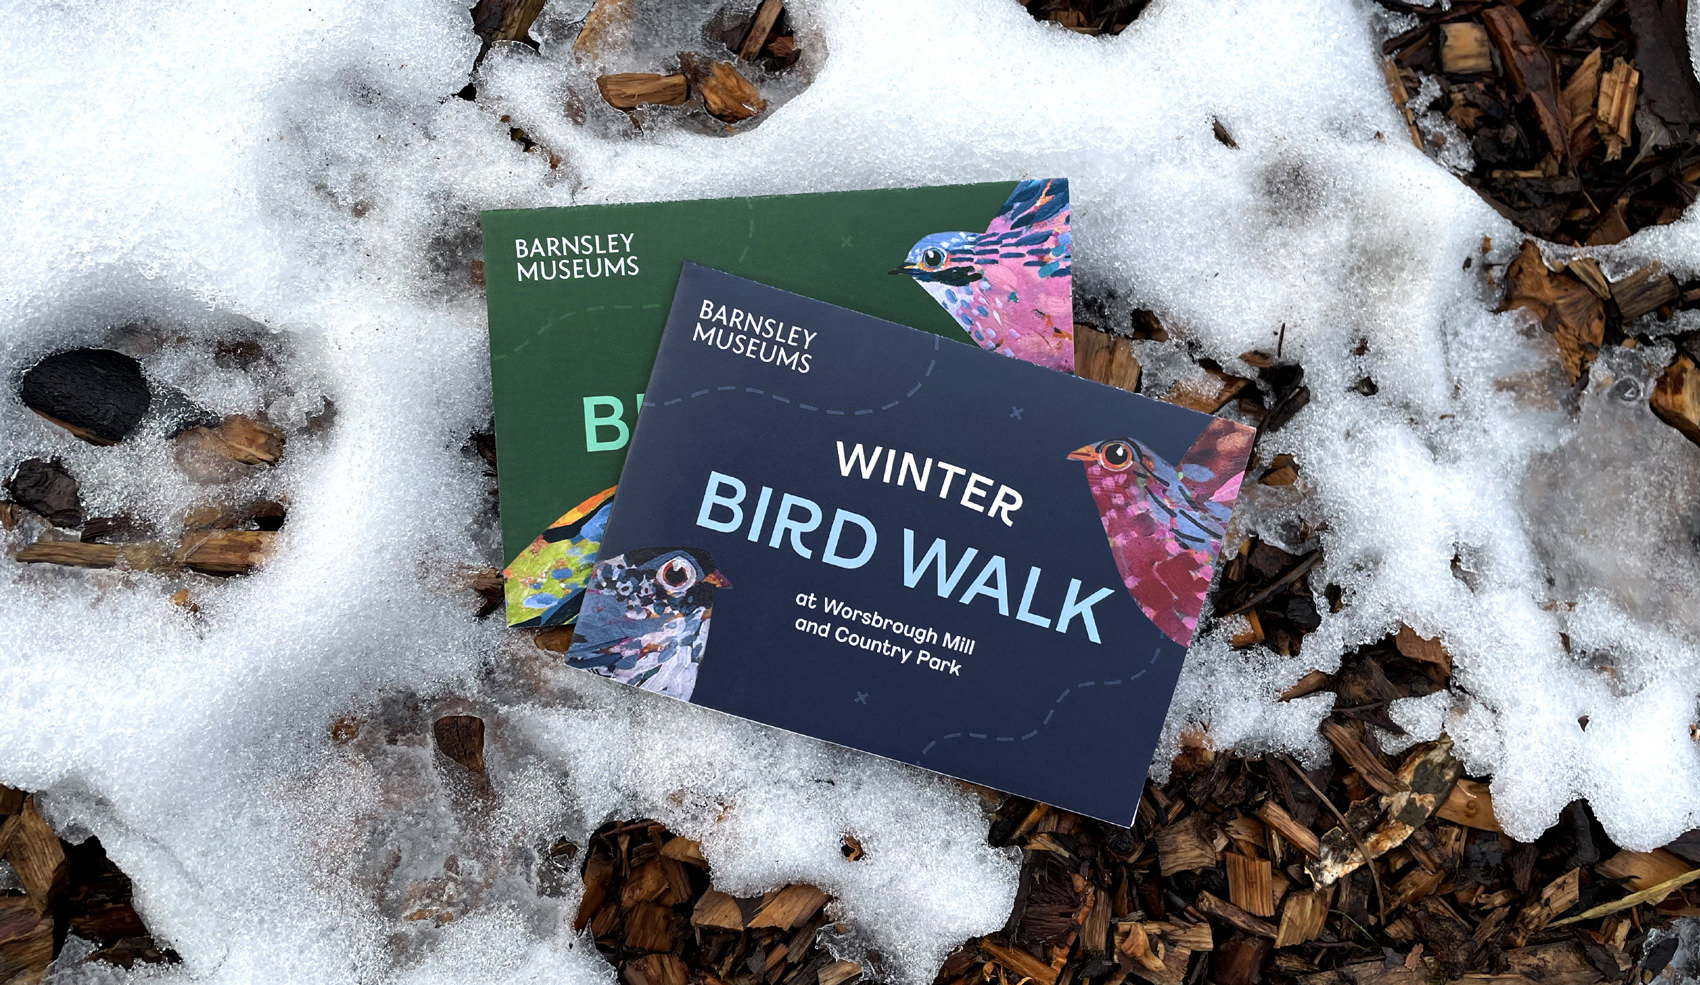 Barnsley Museums National Trust Winter Bird Walk covers